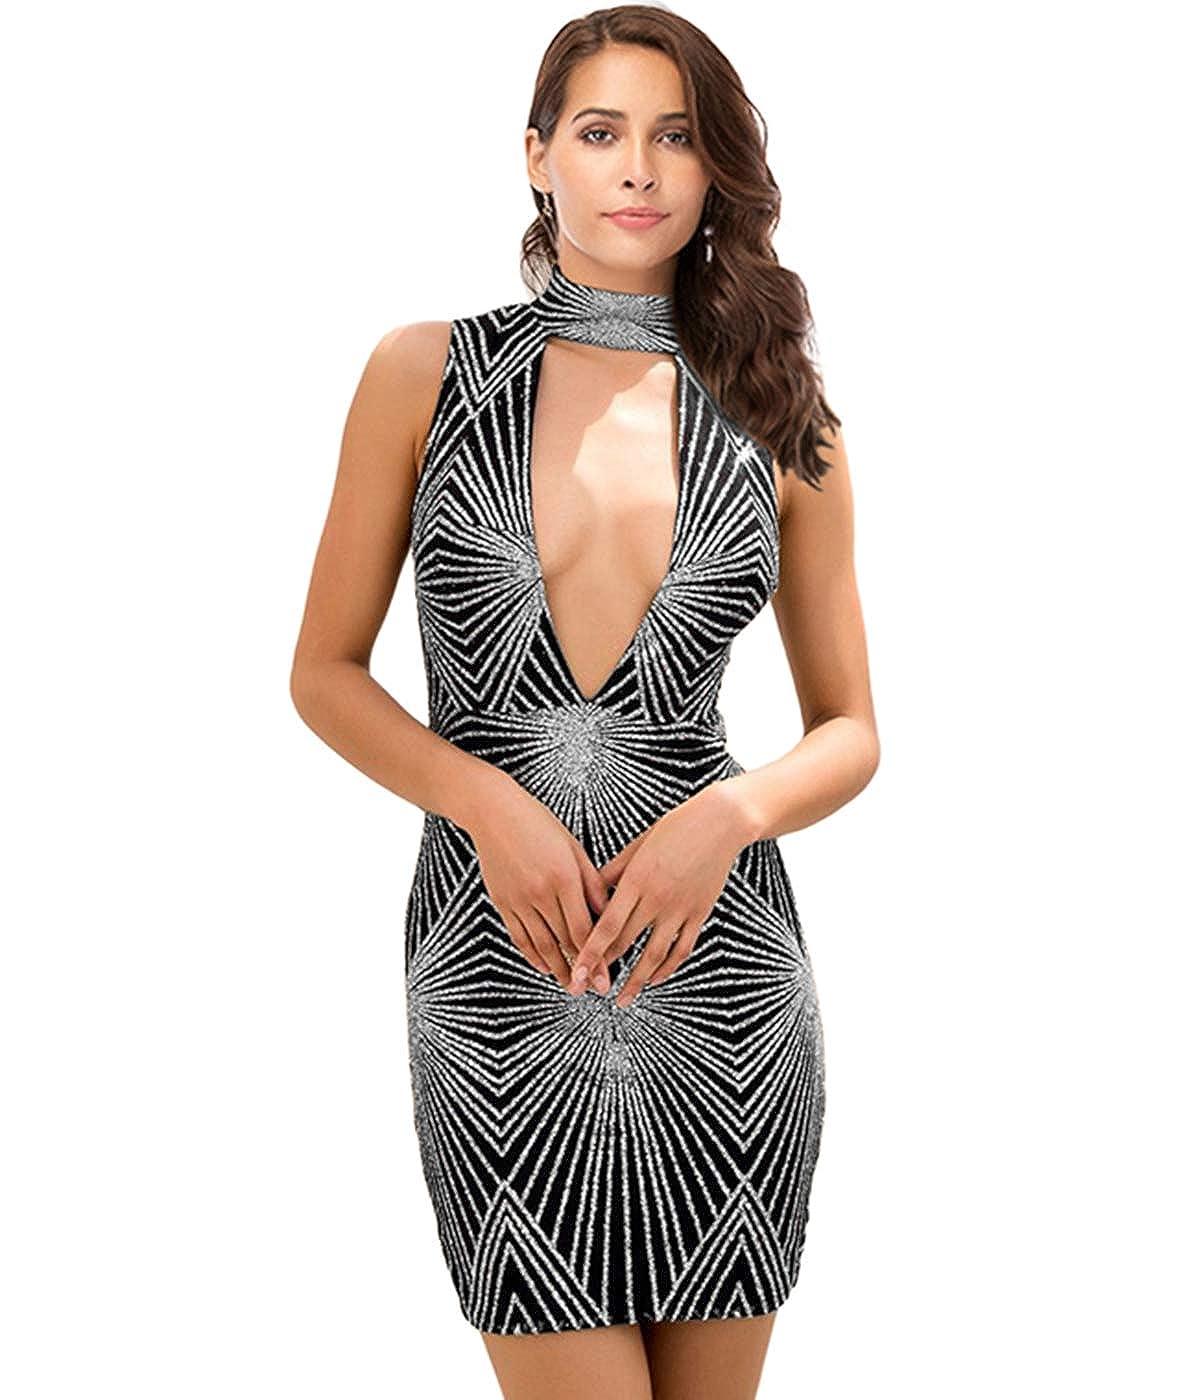 Black Silver 2 Zshujun 1920s Glitter Sequin Summer Casual Club Mini Party Dress for Women Club Bodycon Gowns 2547